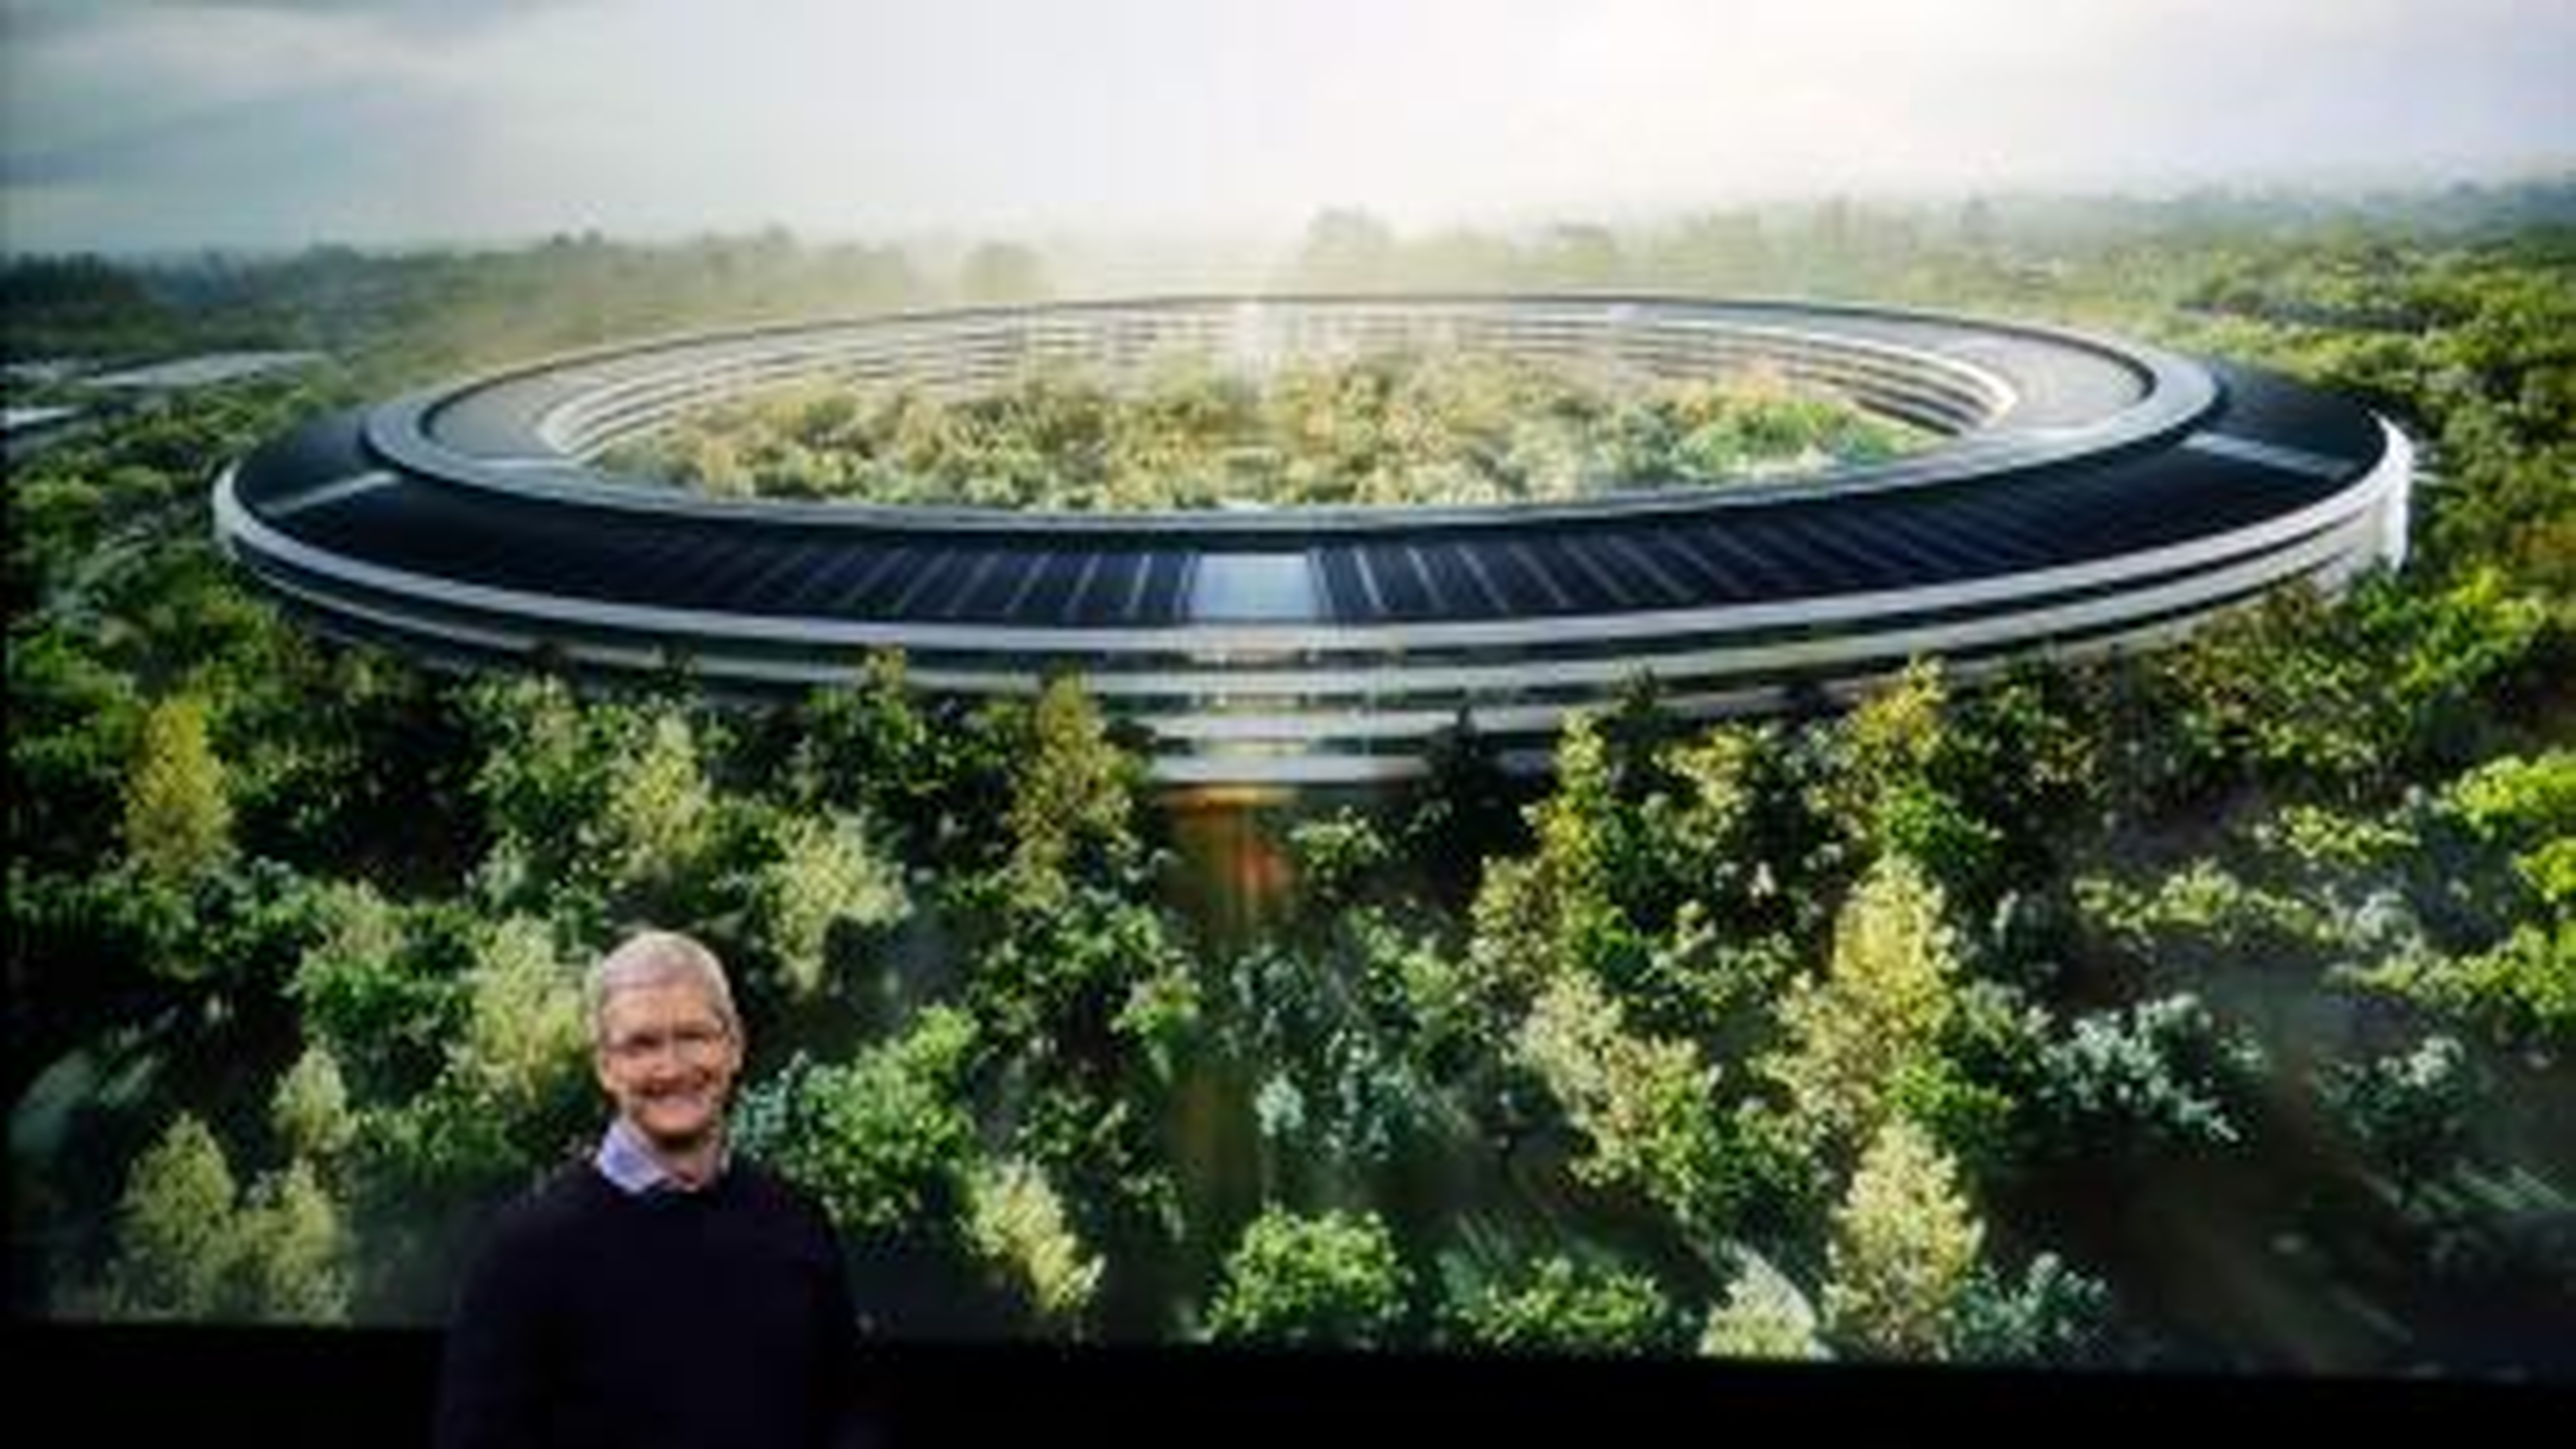 Apples new $5 billion apple park campus has a 100 000 square foot